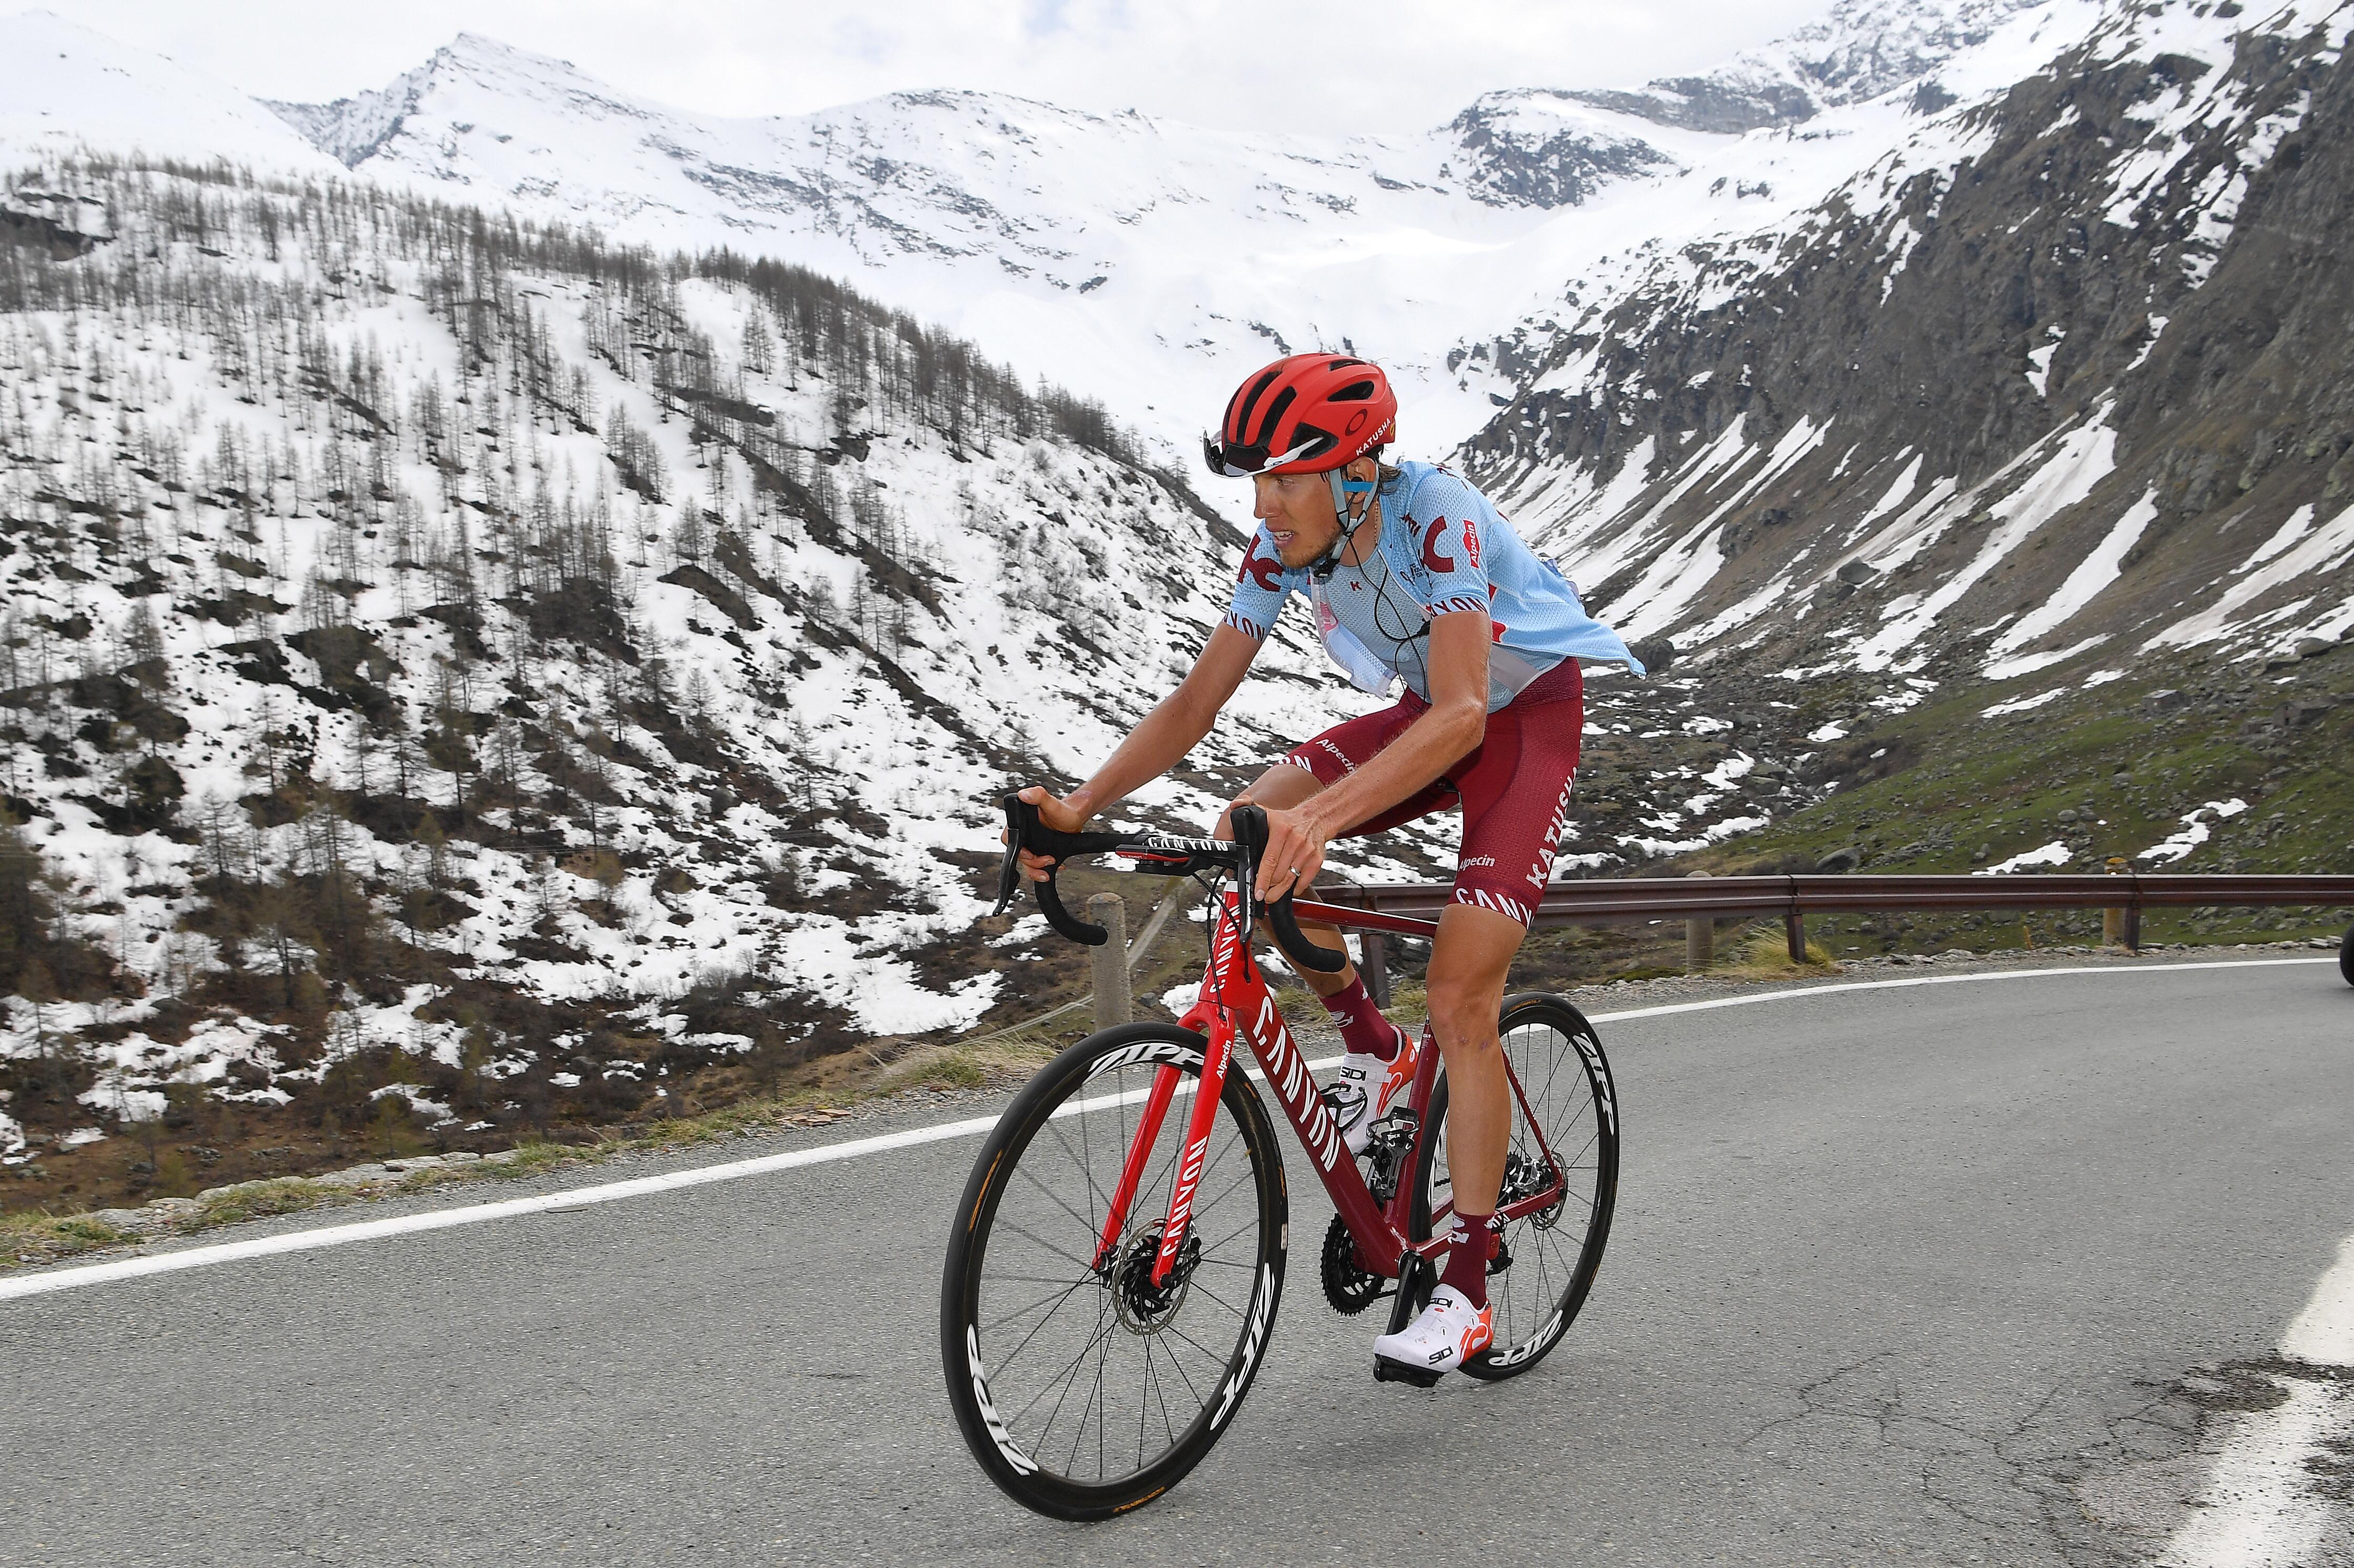 Giro d'Italia: Ilnur Zakarin climbs into contention with stage 13 win